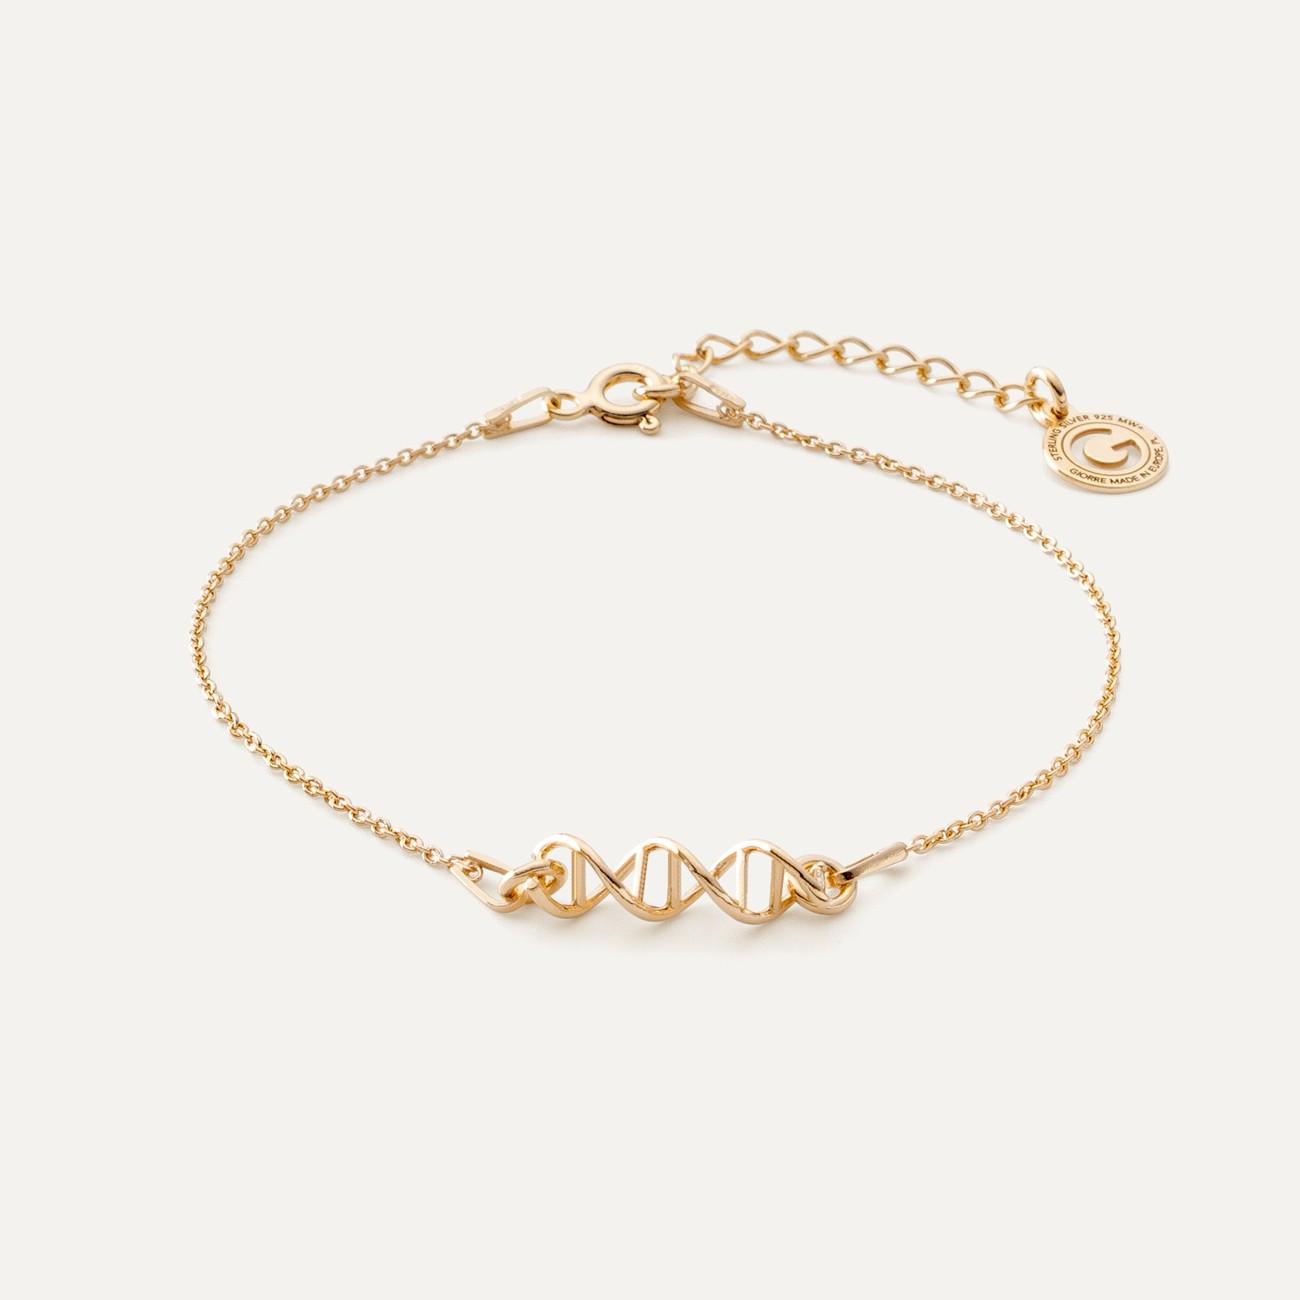 Srebrna bransoletka wzór DNA, 925